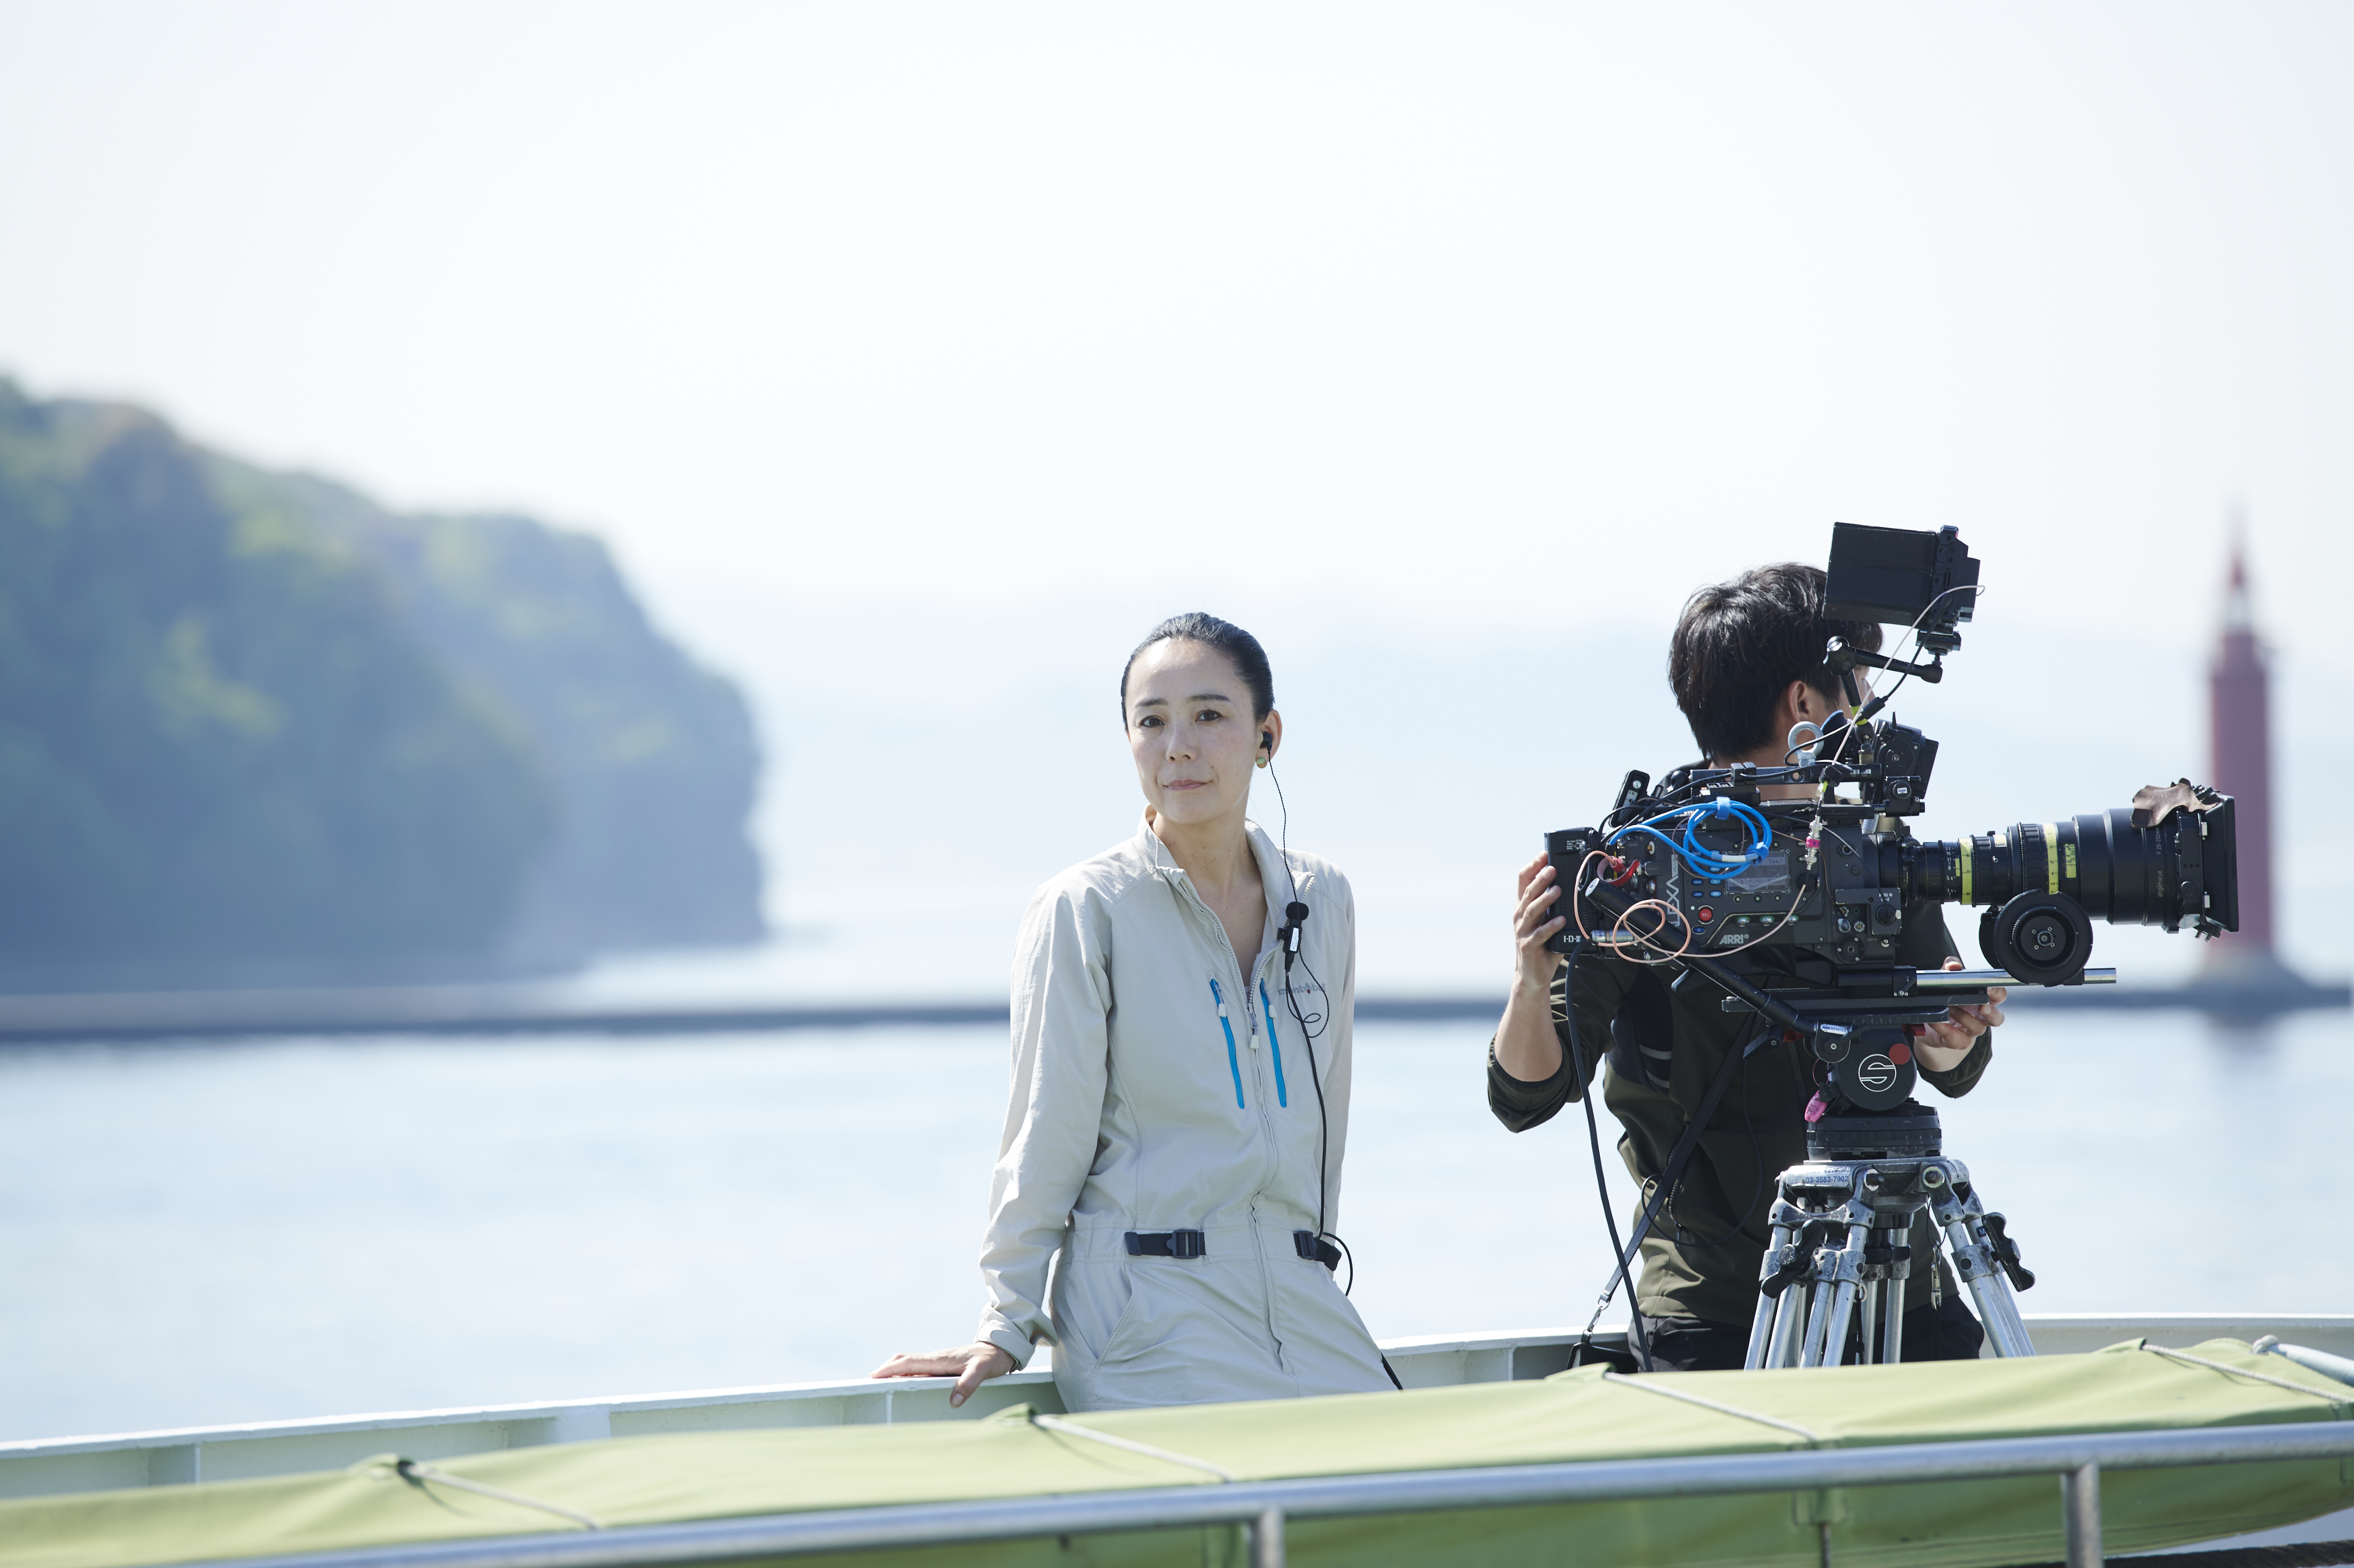 Award-Winning Director, Naomi Kawase